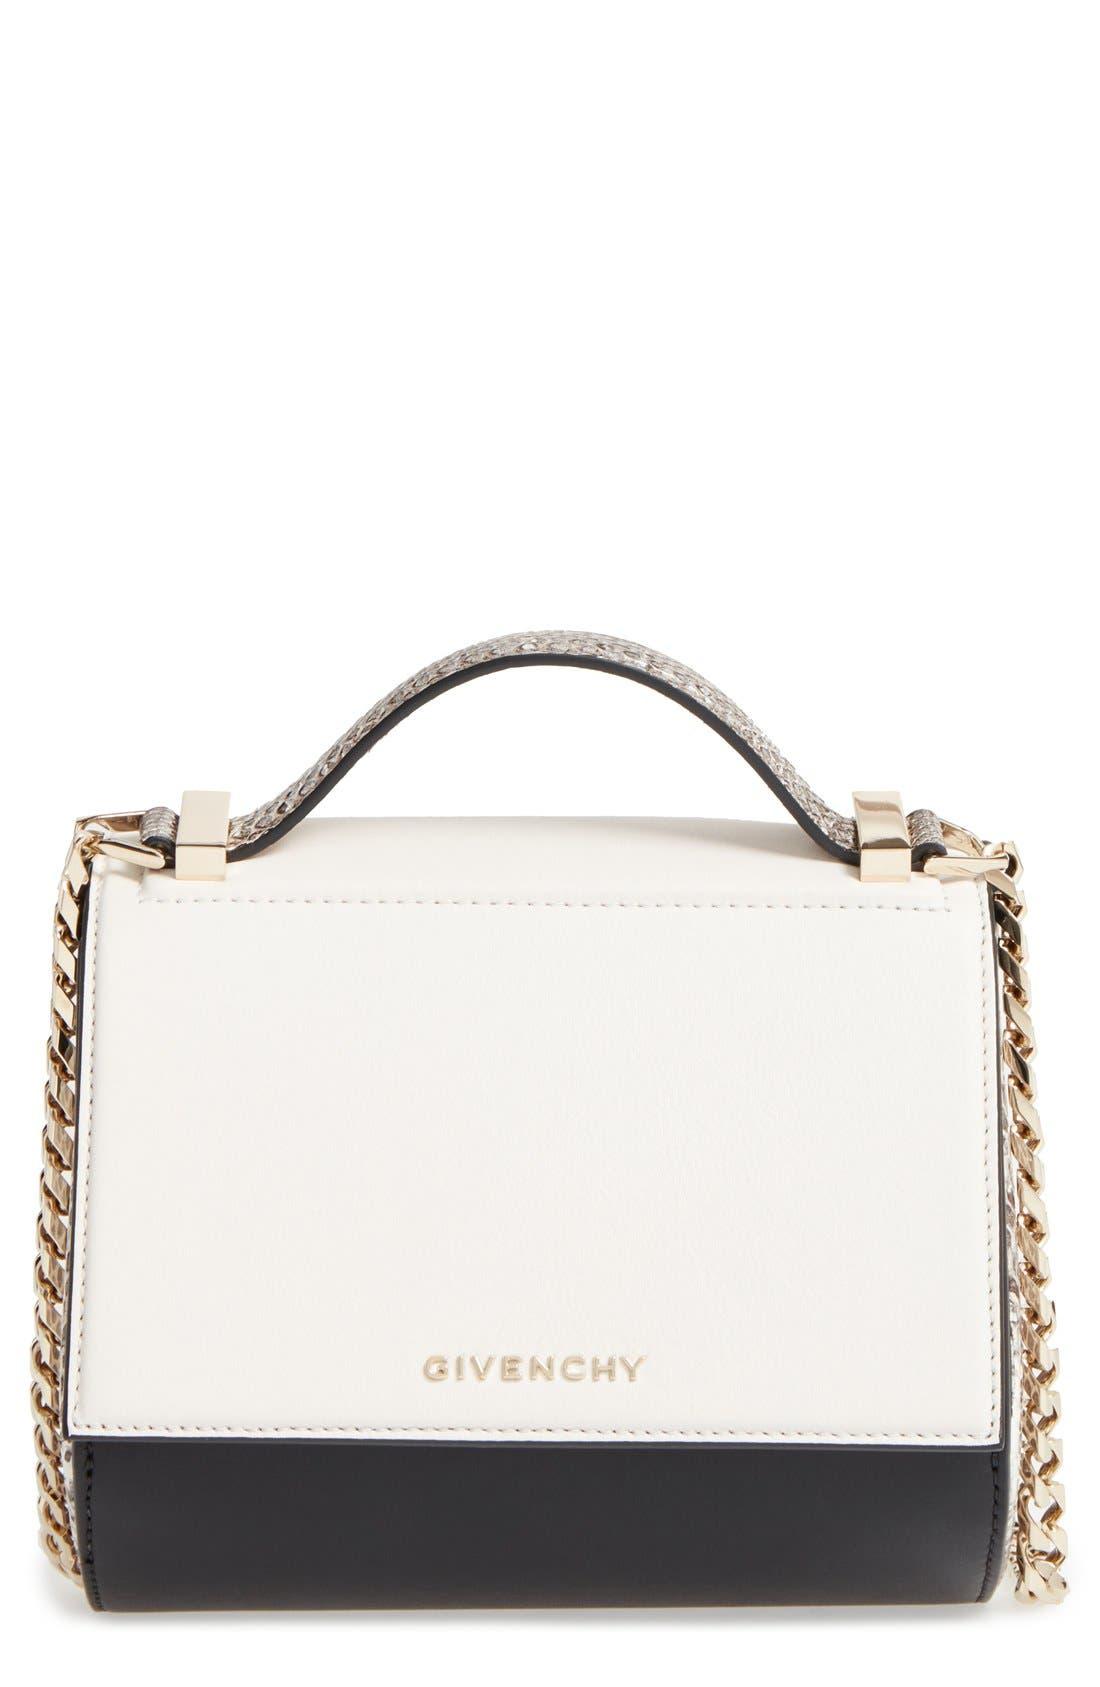 Alternate Image 1 Selected - Givenchy Pandora Box Genuine Snakeskin Crossbody Bag